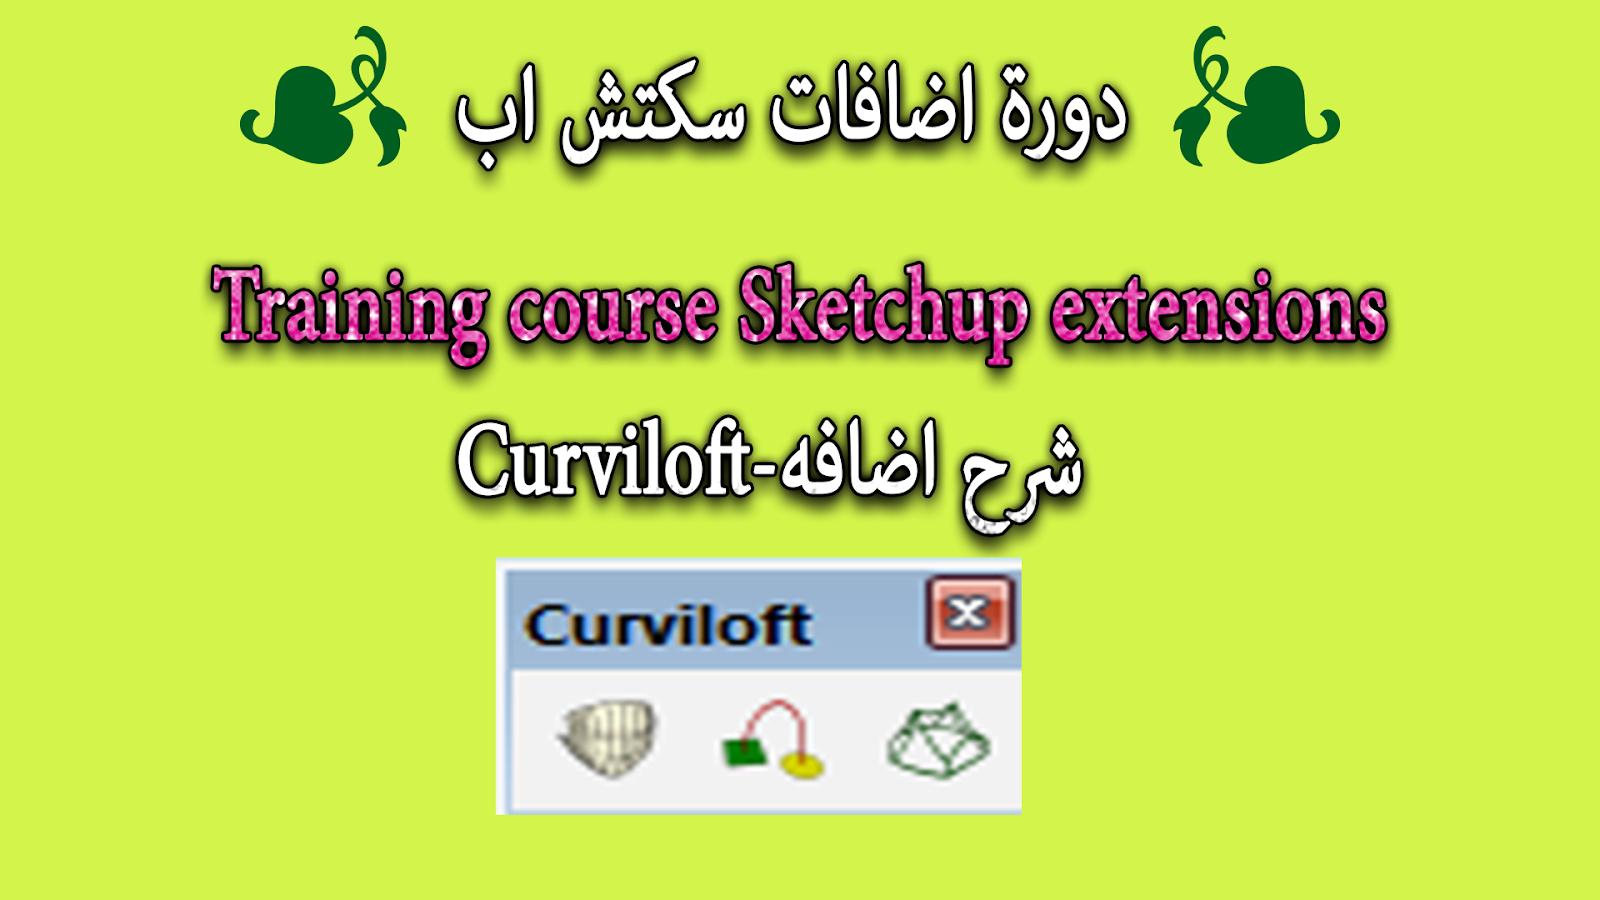 1-شرح اضافات سكتش اب-شرح اضافه-Training course Sketchup extensions